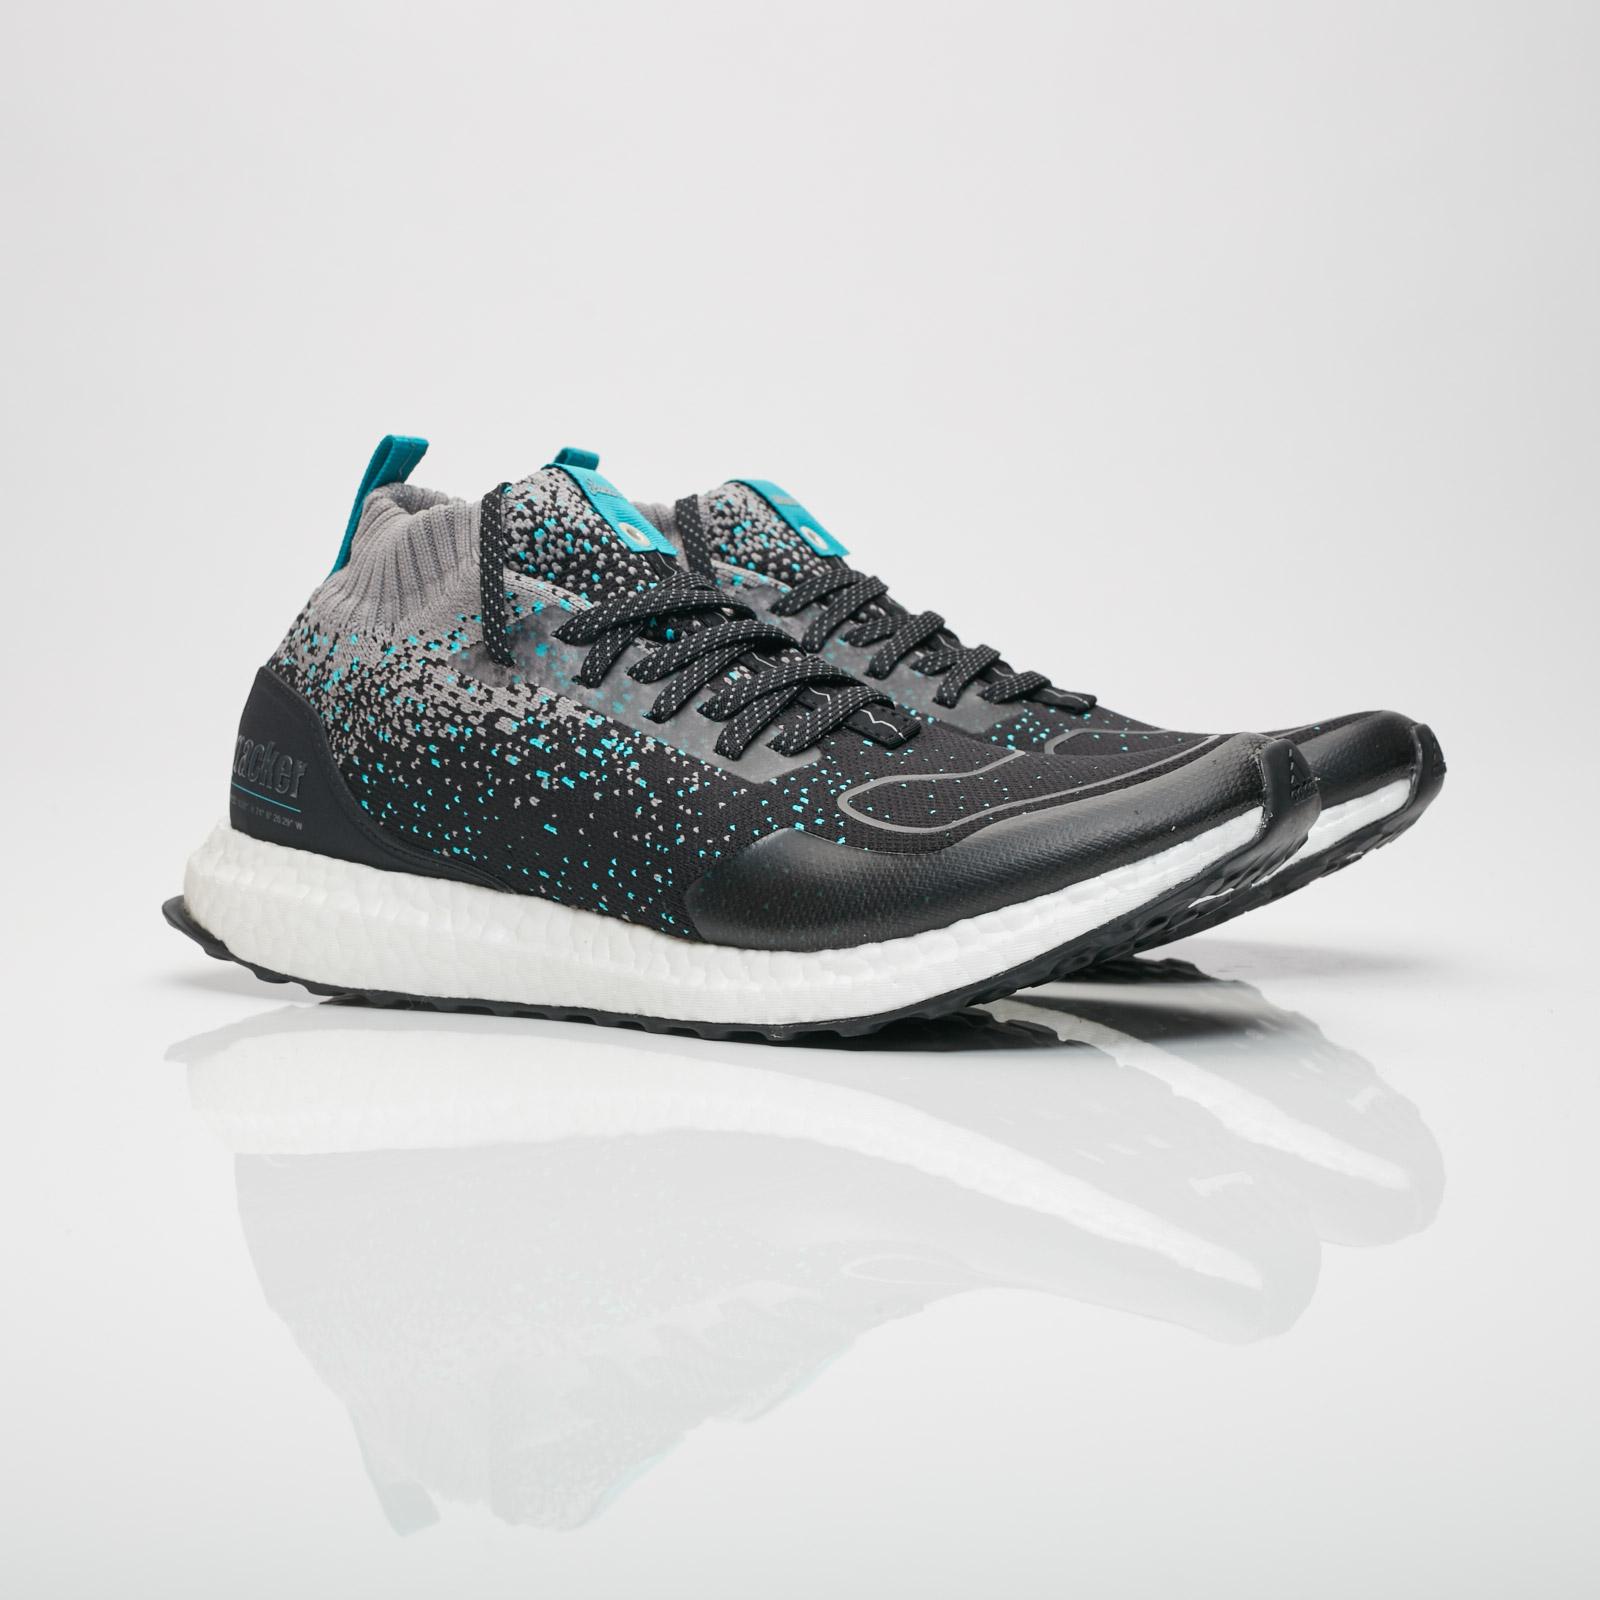 adidas Ultraboost Mid Packer x Solebox - Cm7882 - Sneakersnstuff ... c87c10c06